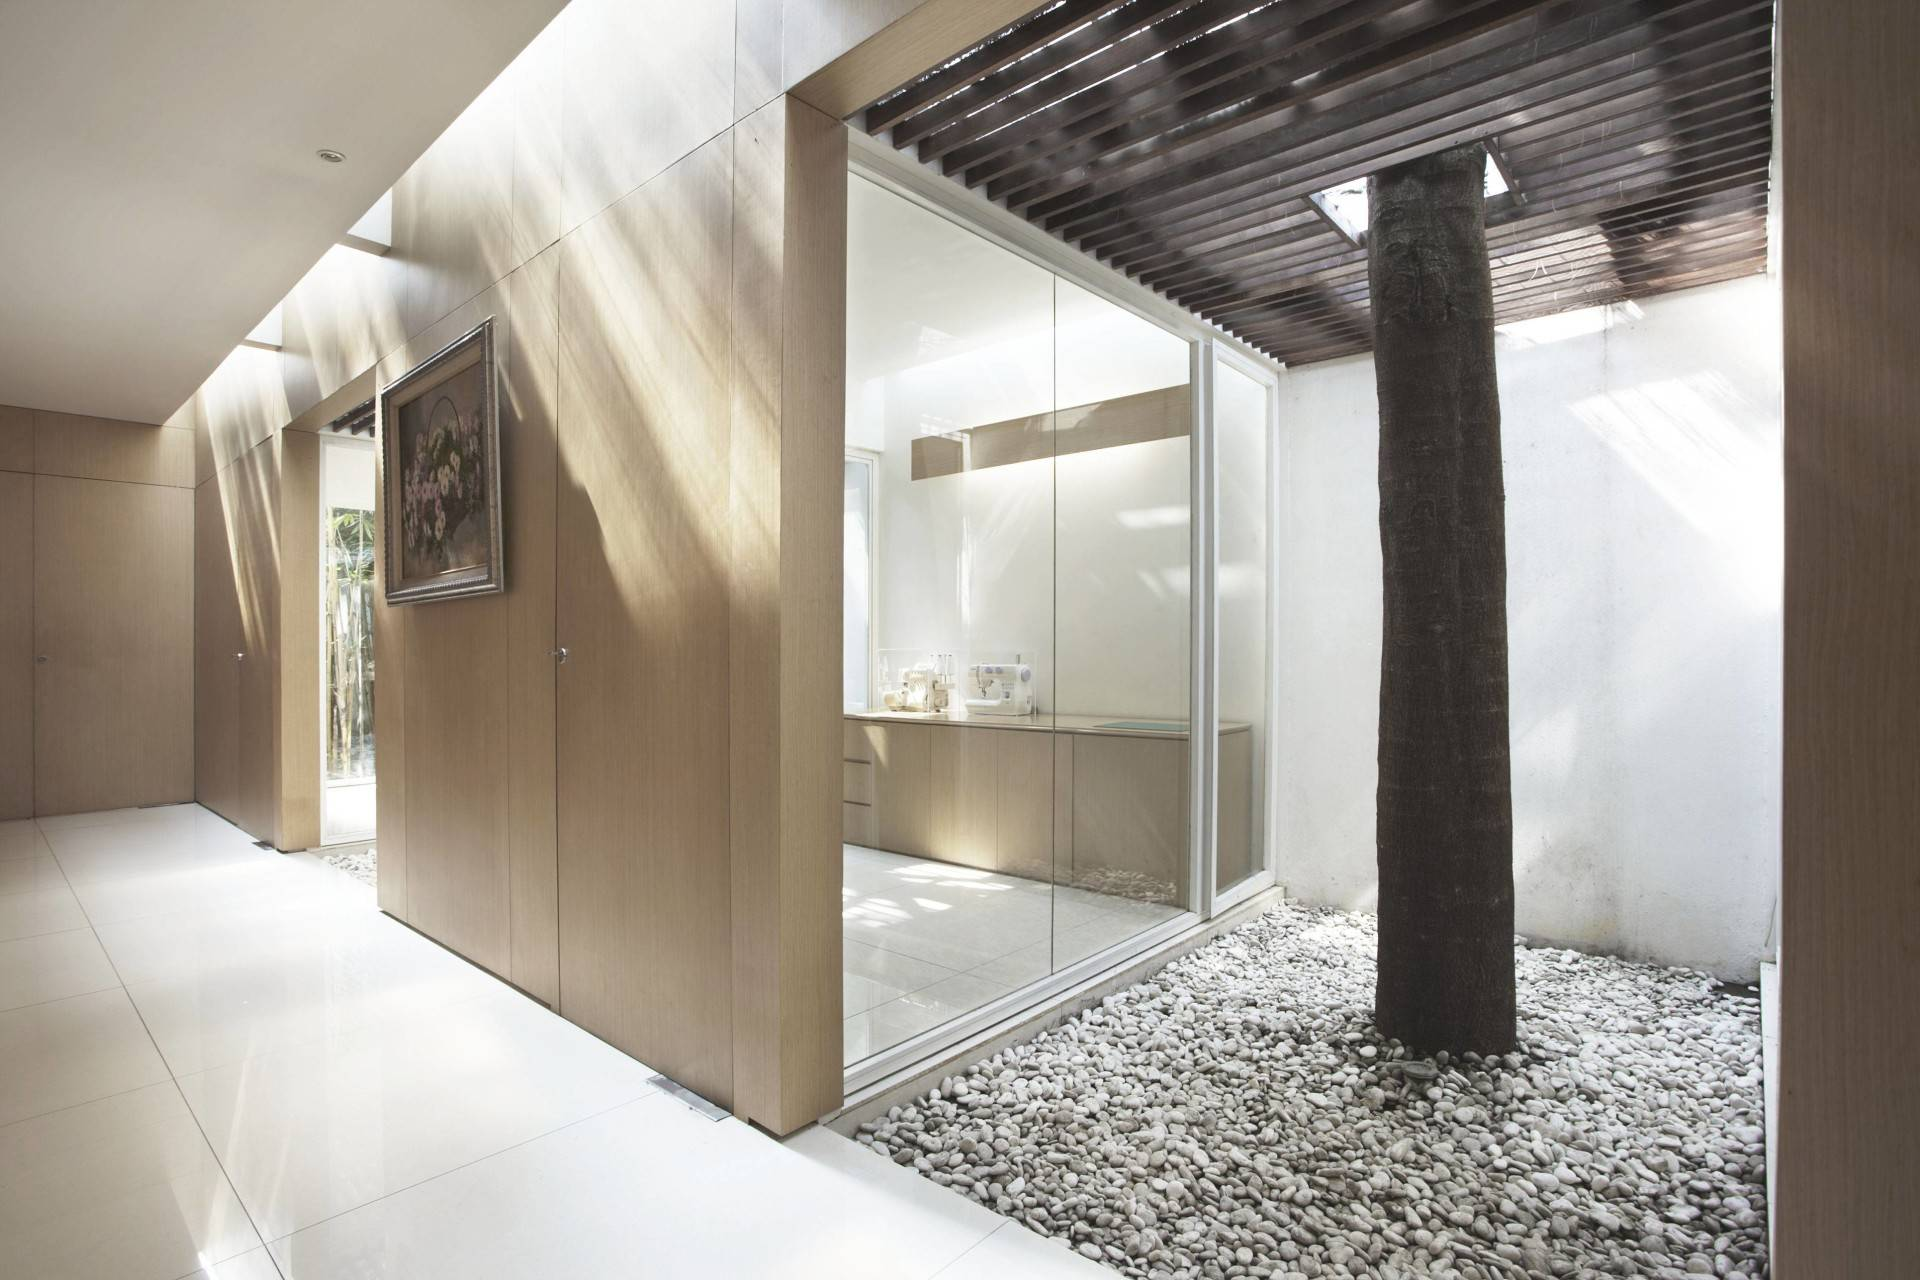 Antony Liu + Ferry Ridwan / Studio Tonton Ew House Serpong, Tangerang Serpong, Tangerang Ew House - Indoor Garden Area Modern  8104